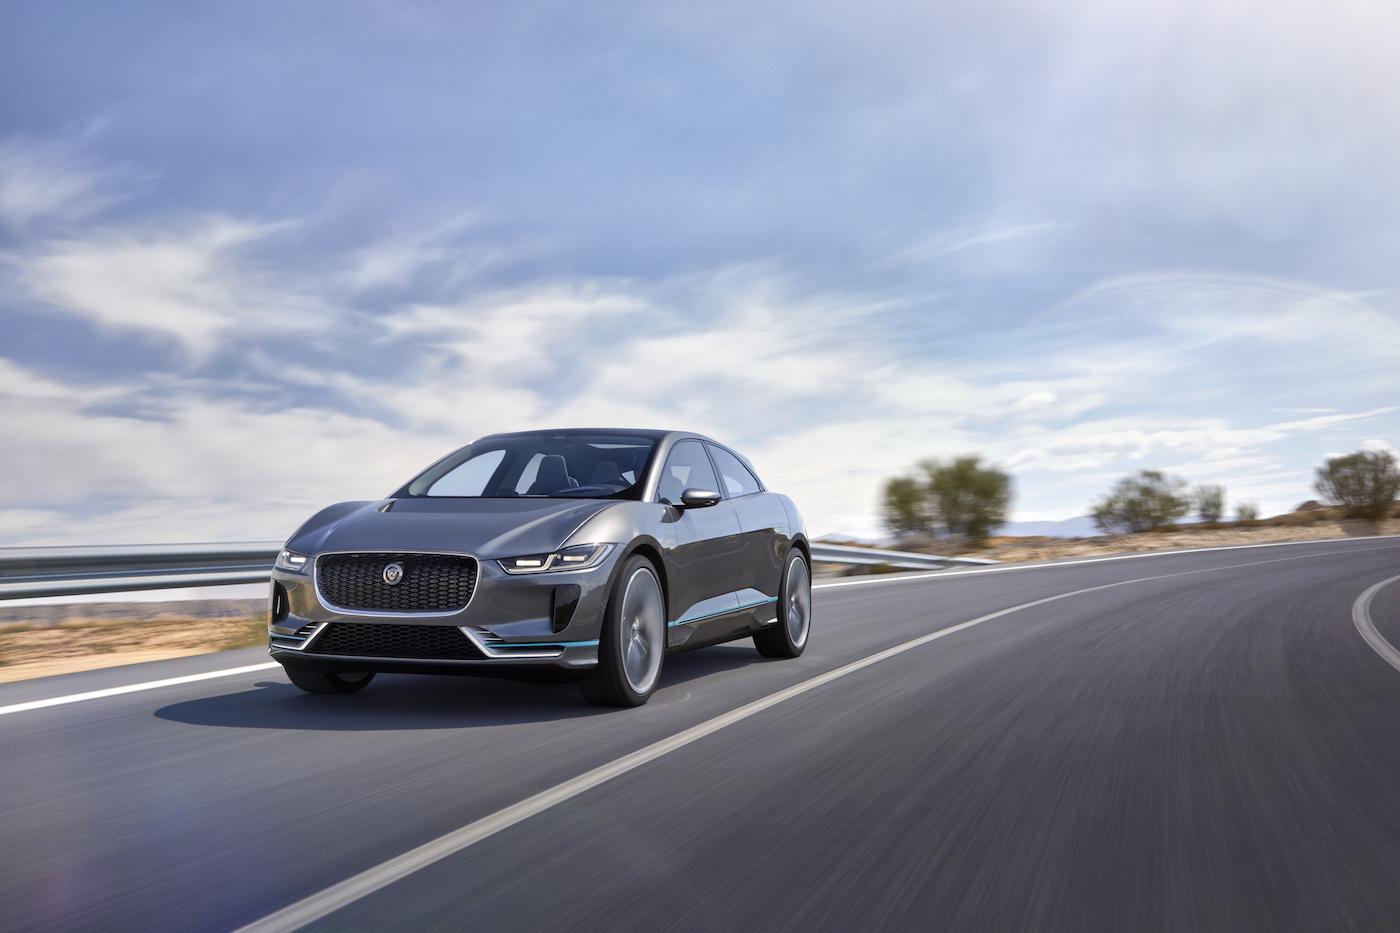 Der neue i-Pace: So will Jaguar Tesla & Co. angreifen 7